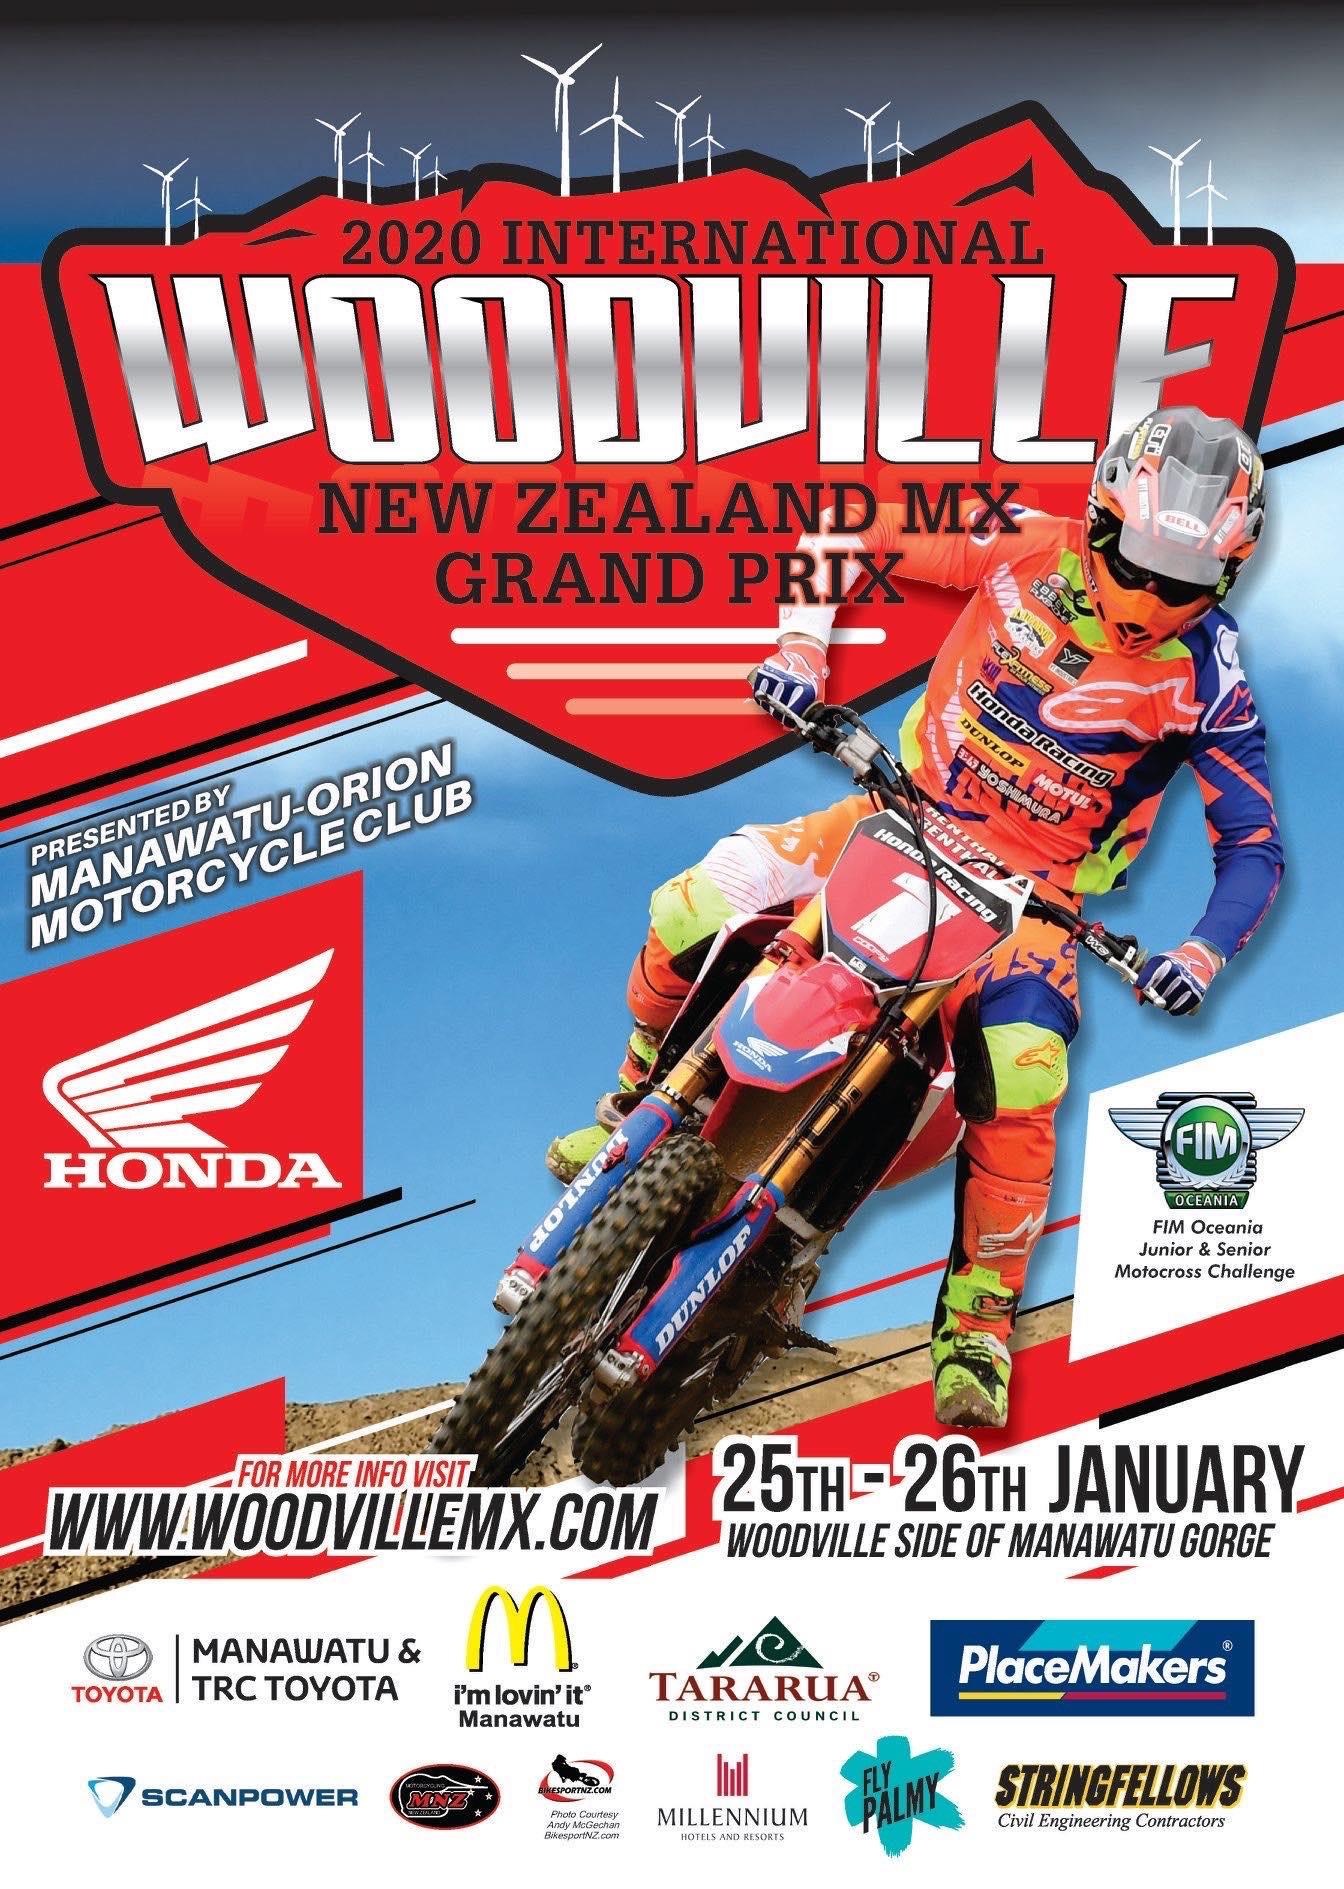 International Woodville New Zealand MX GP